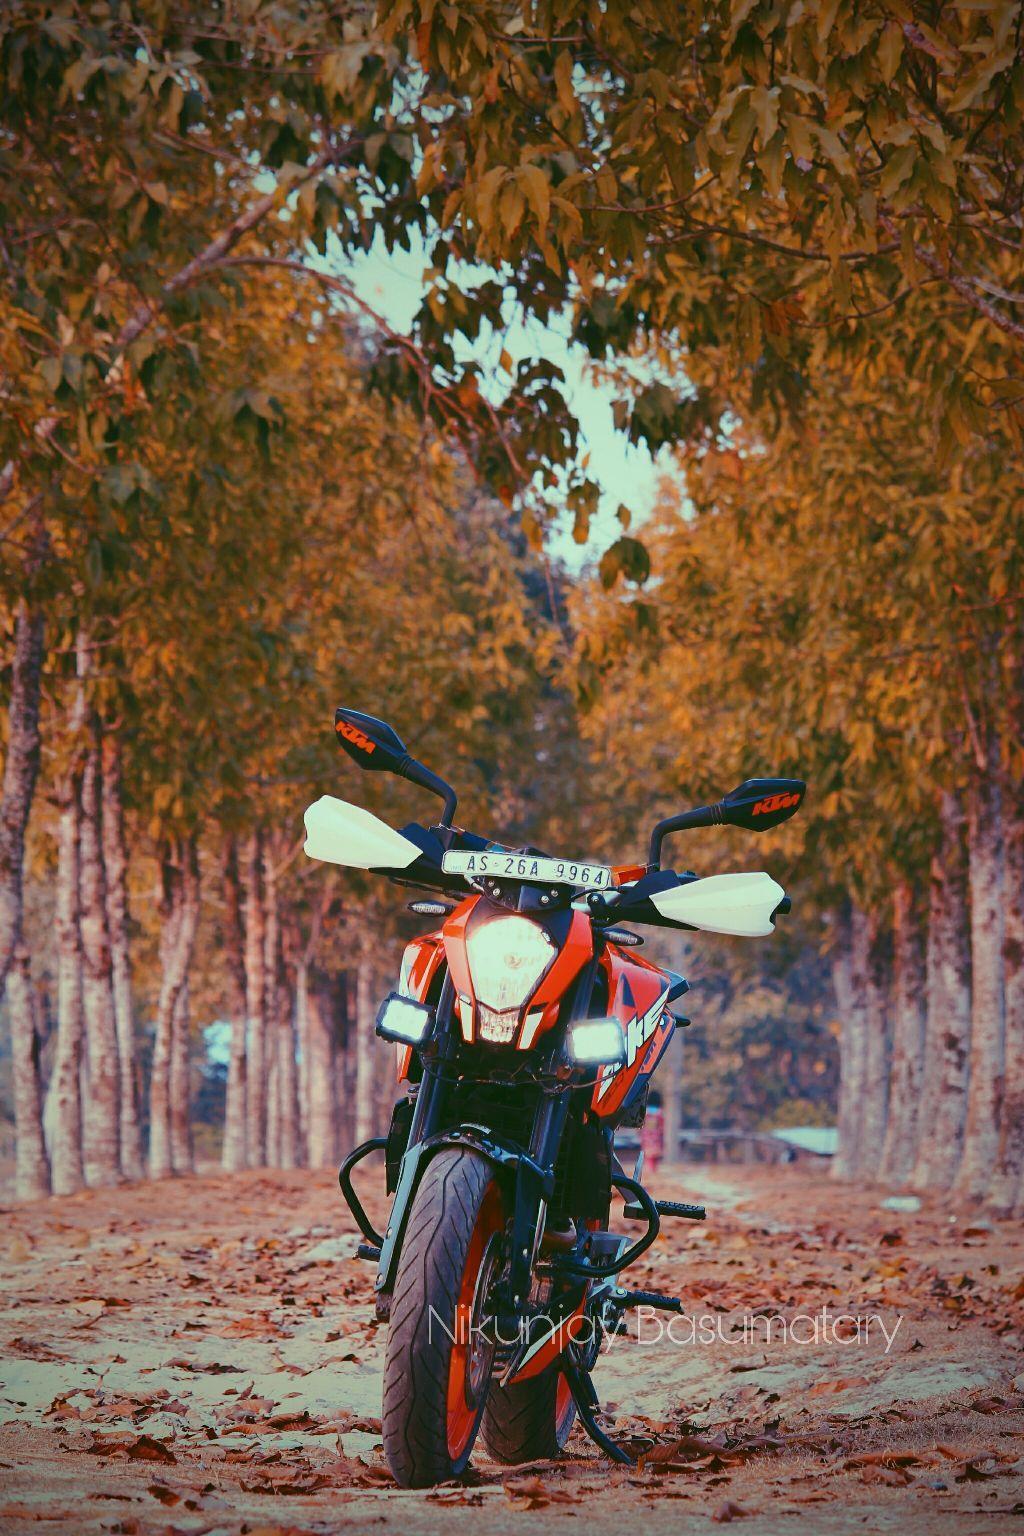 Ktm Duke200 Nature Photography Love Background Images Black